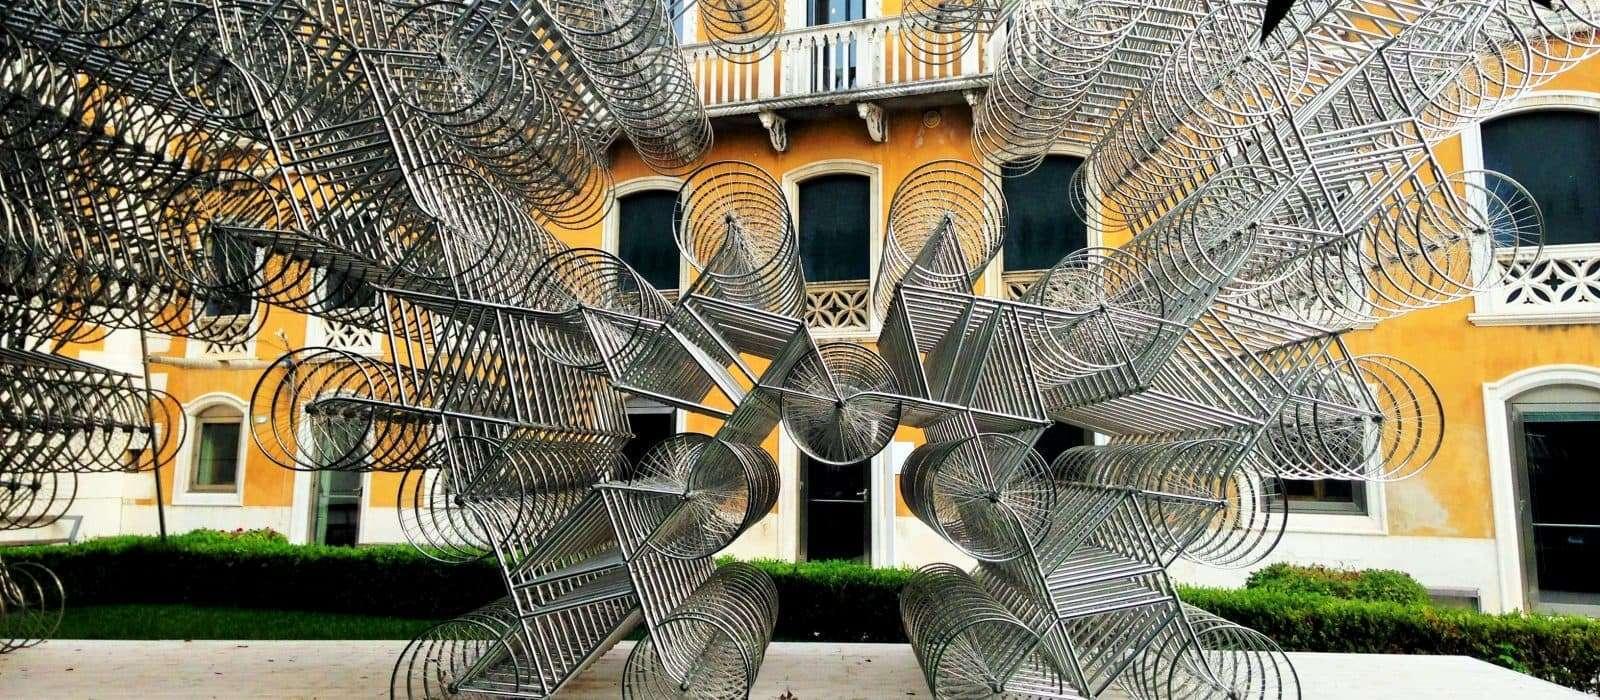 Venice Italy Contemporary modern art Biennale